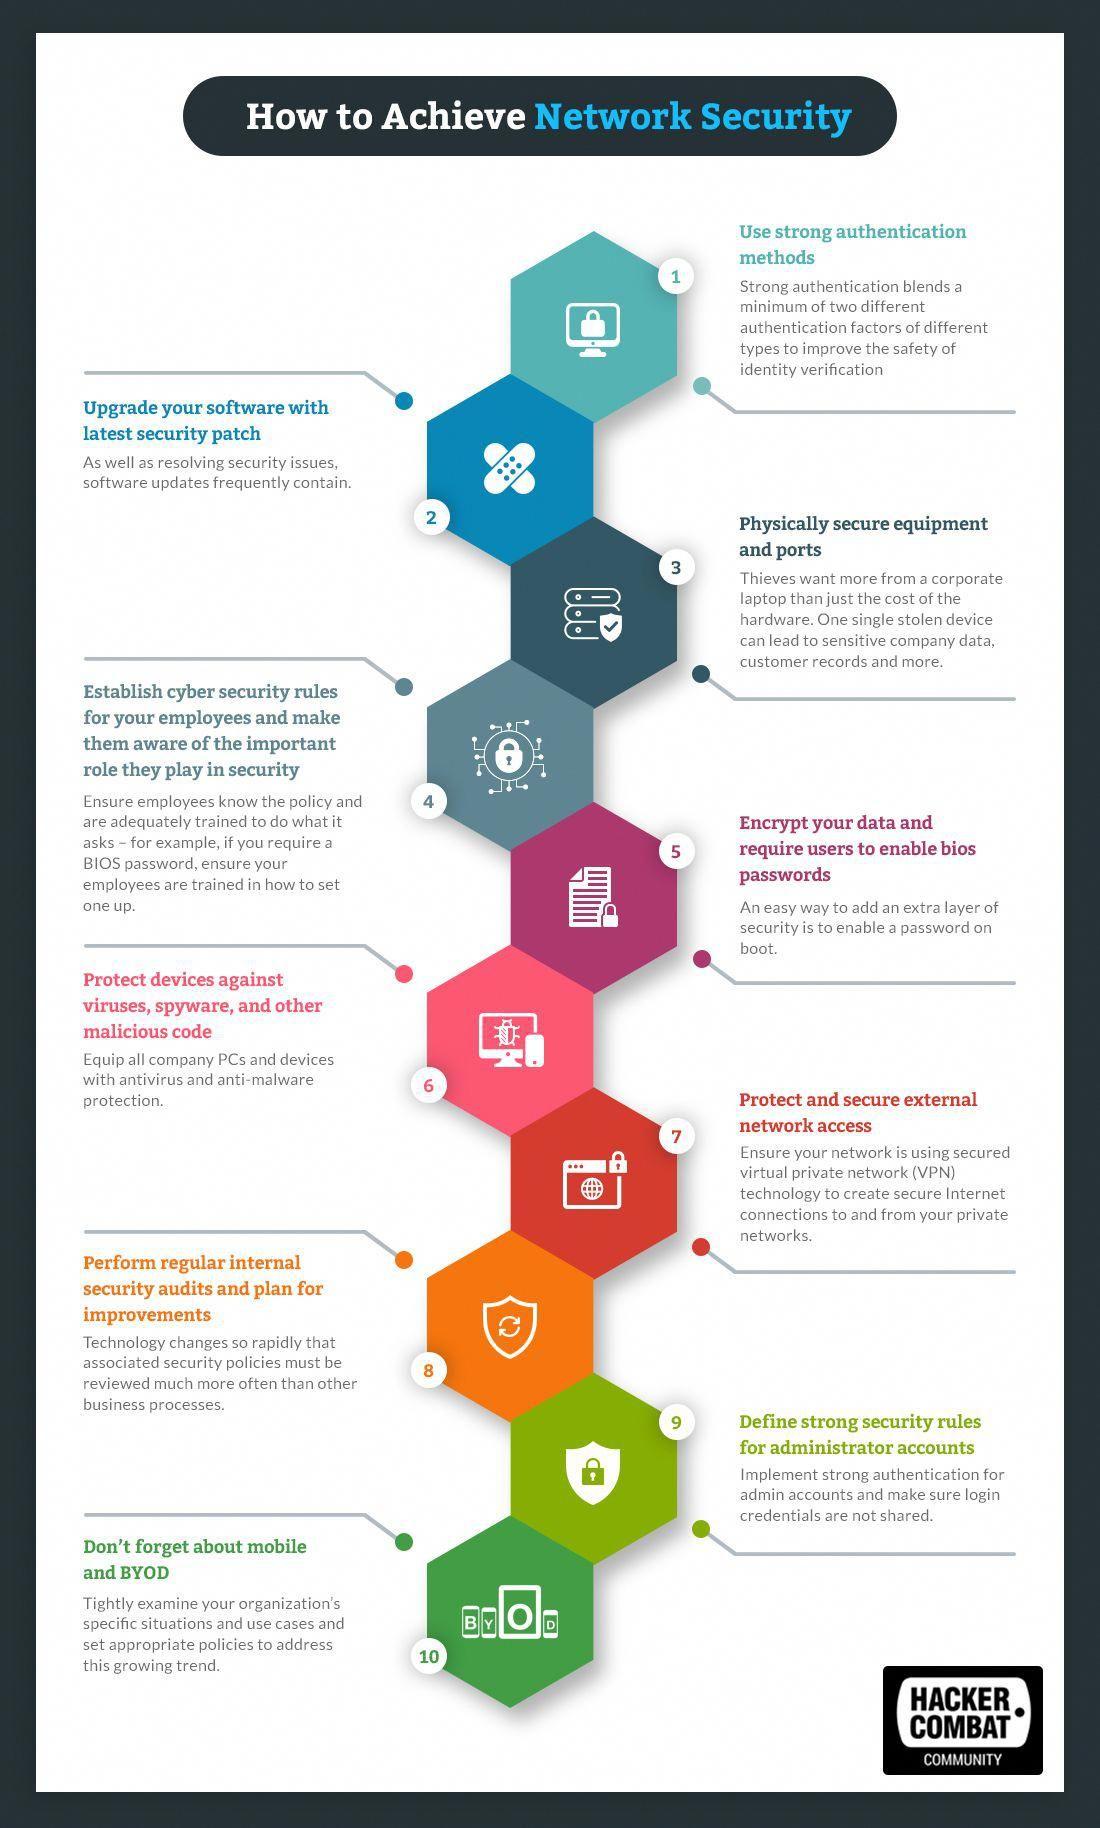 Network Security Malwareanalysis Cyber Security Awareness Cyber Security Cyber Security Education